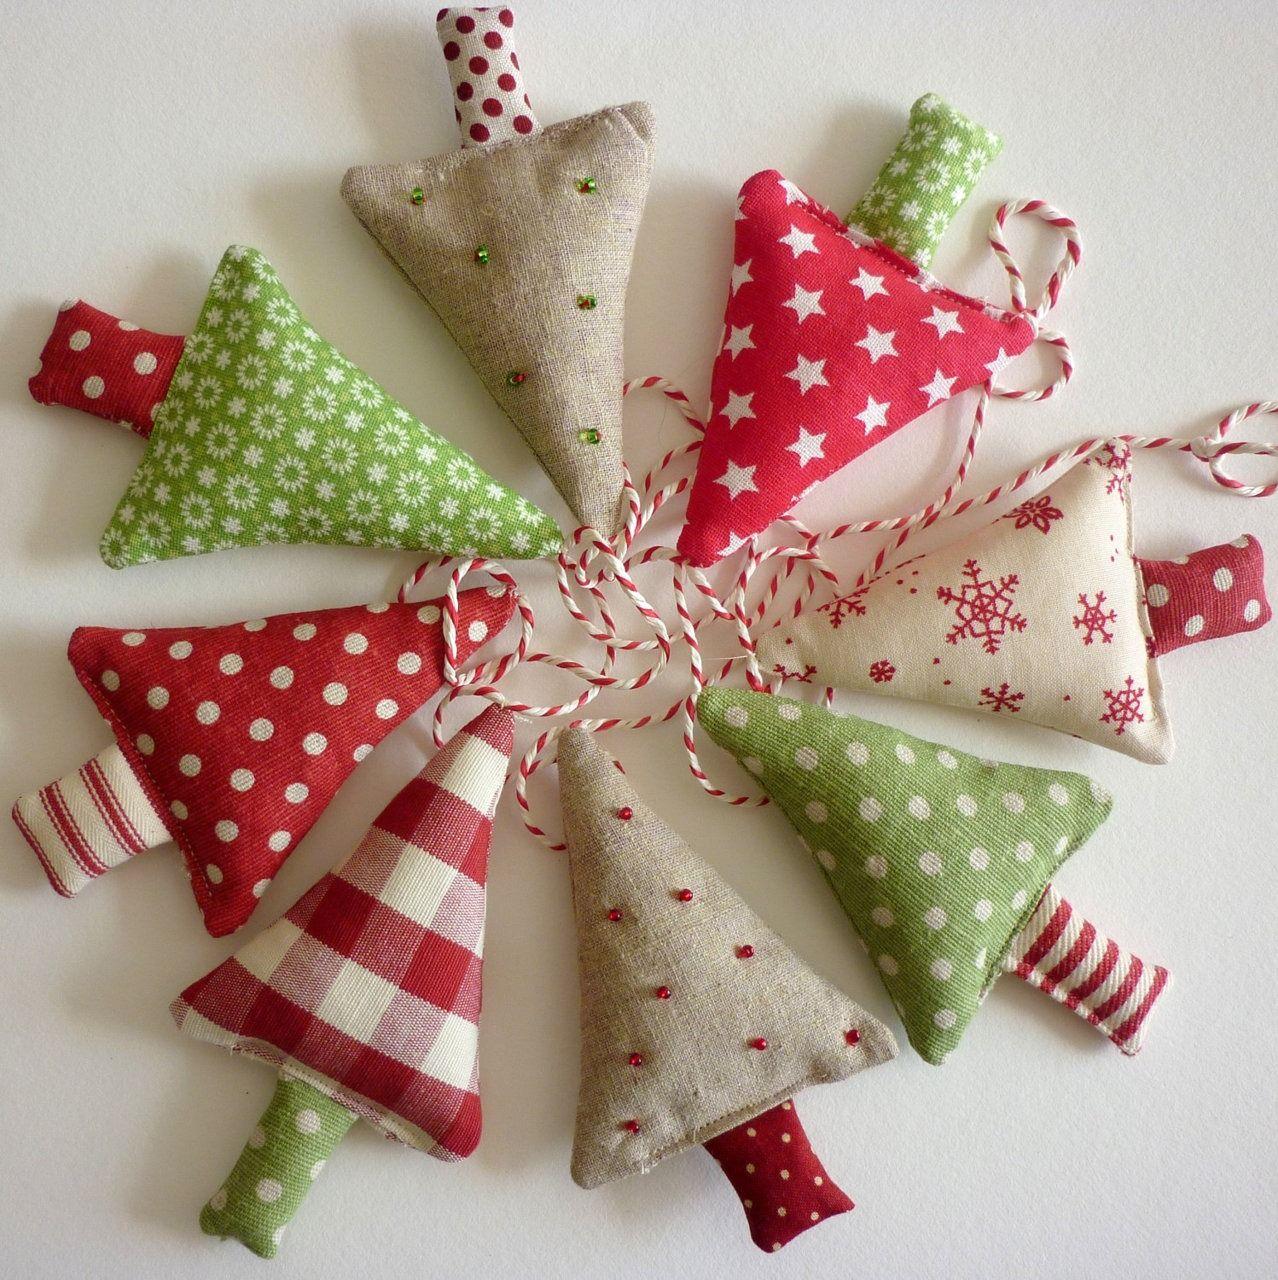 Christmas Sewing Craft Ideas Part - 26: Petitevanou - Fabric Ornaments, Good Idea For Scraps Make Garland